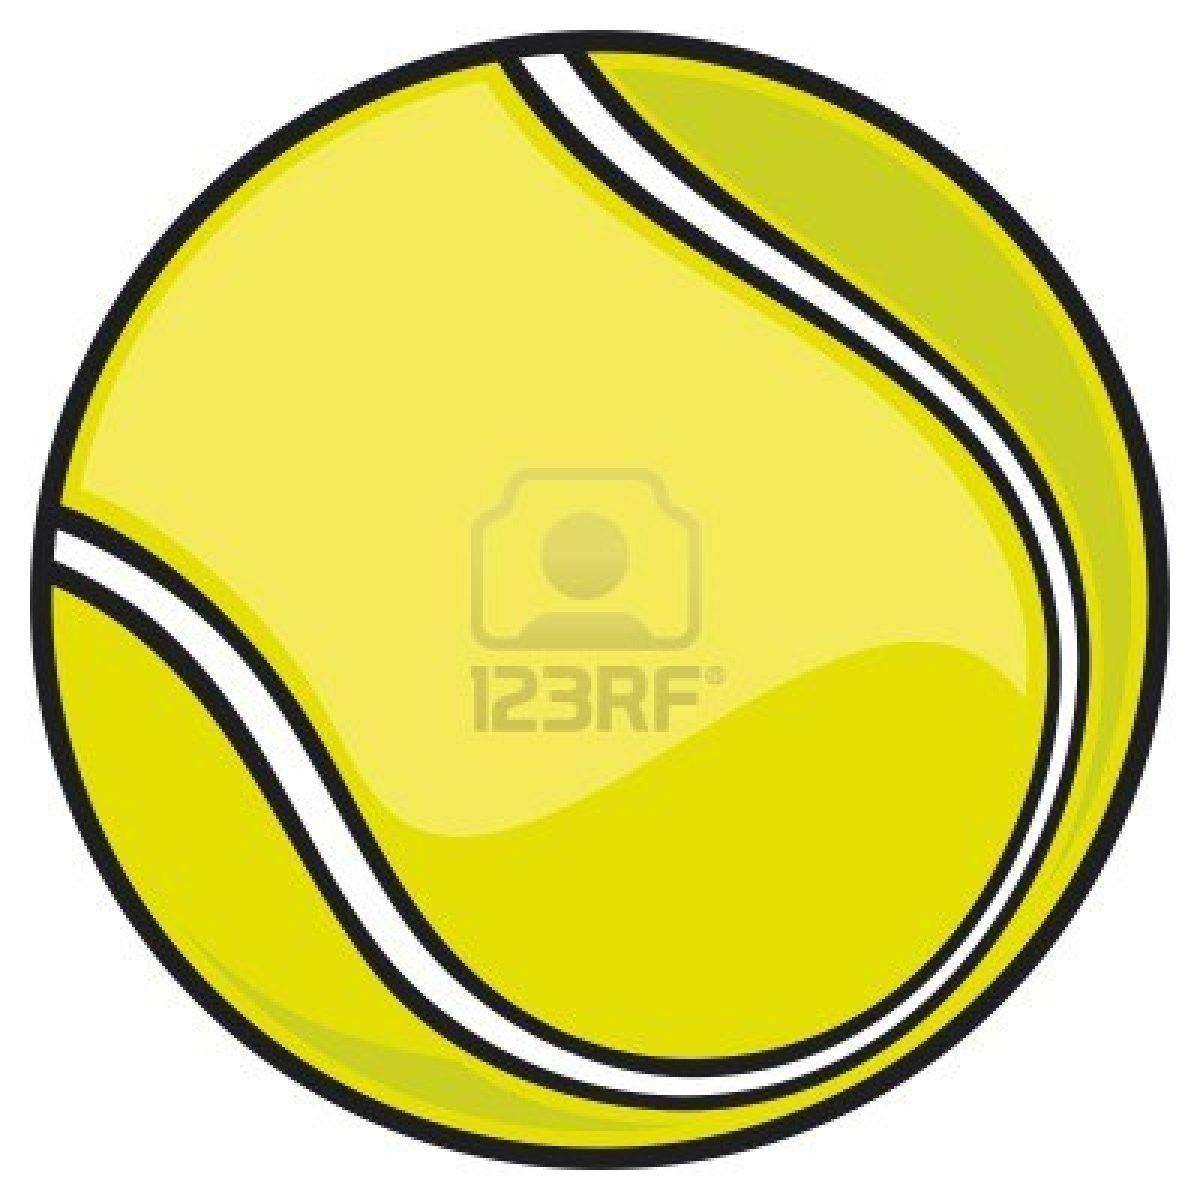 1200x1200 Ball Clipart Tennis Ball